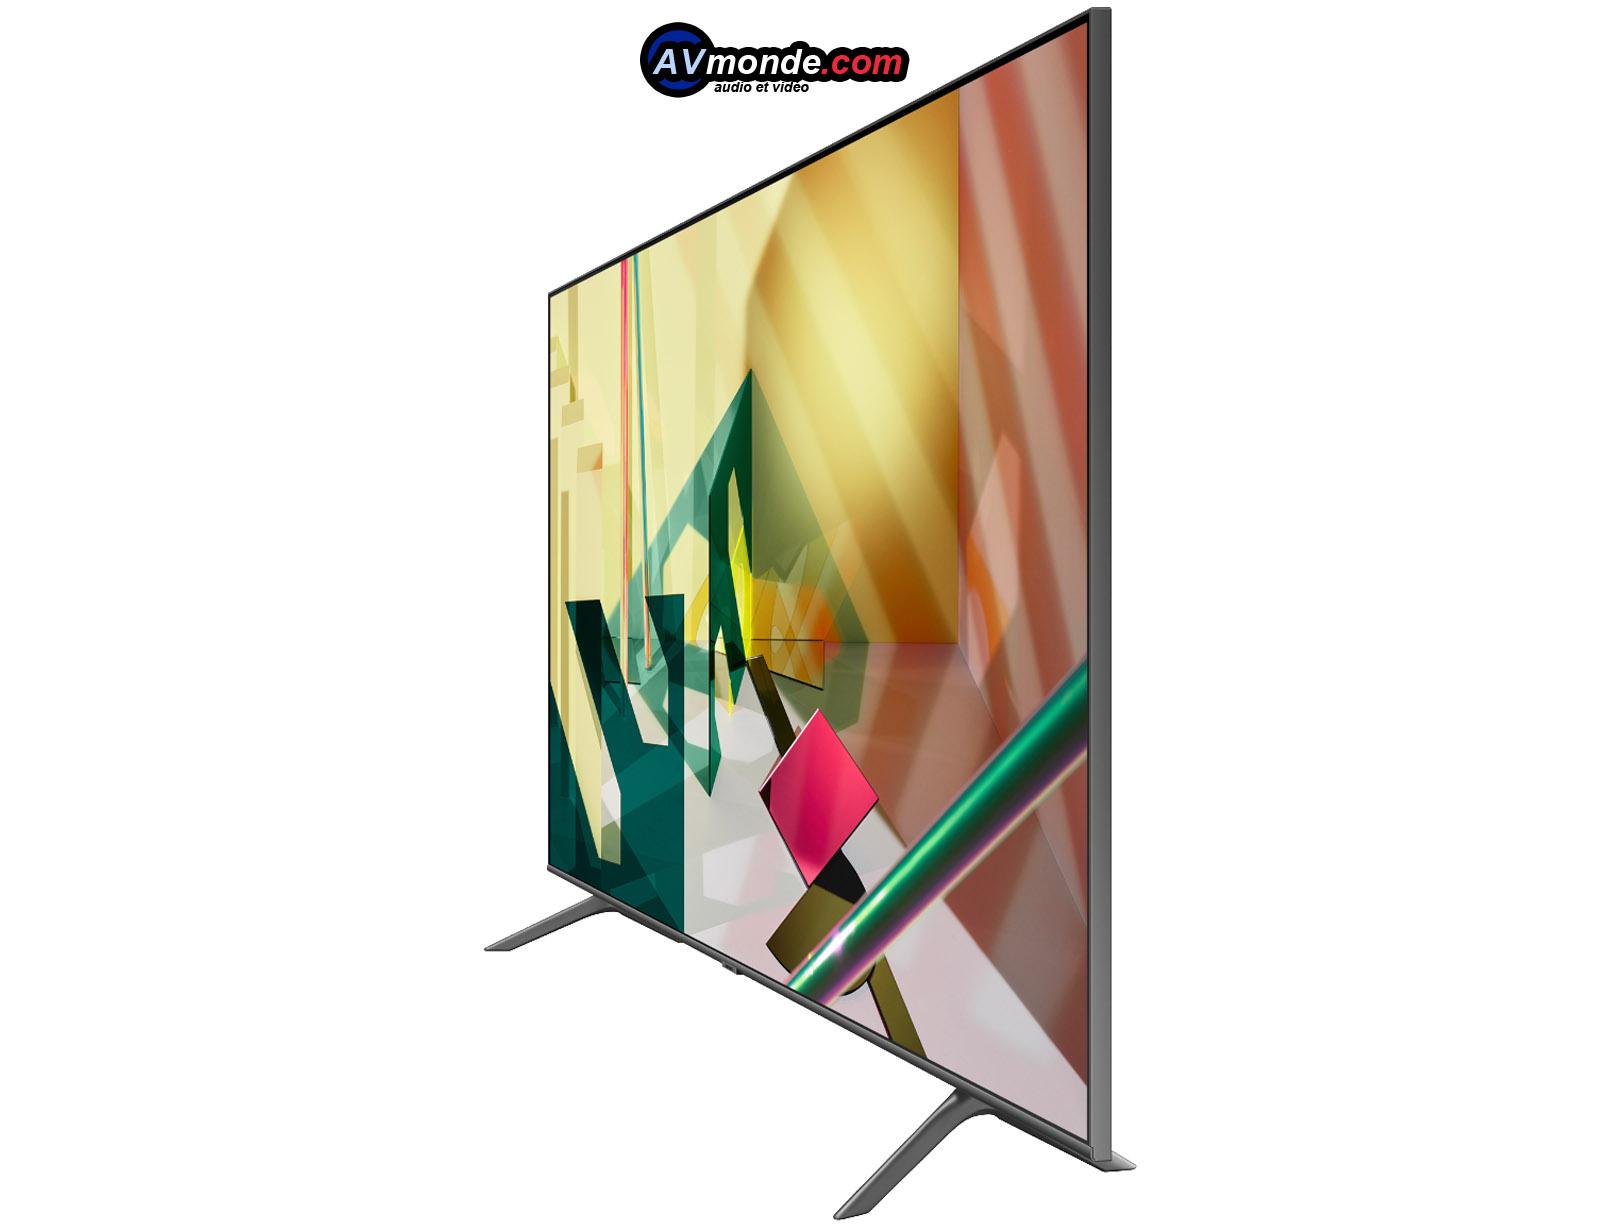 Samsung QE85Q70T QLED 4K TV Test